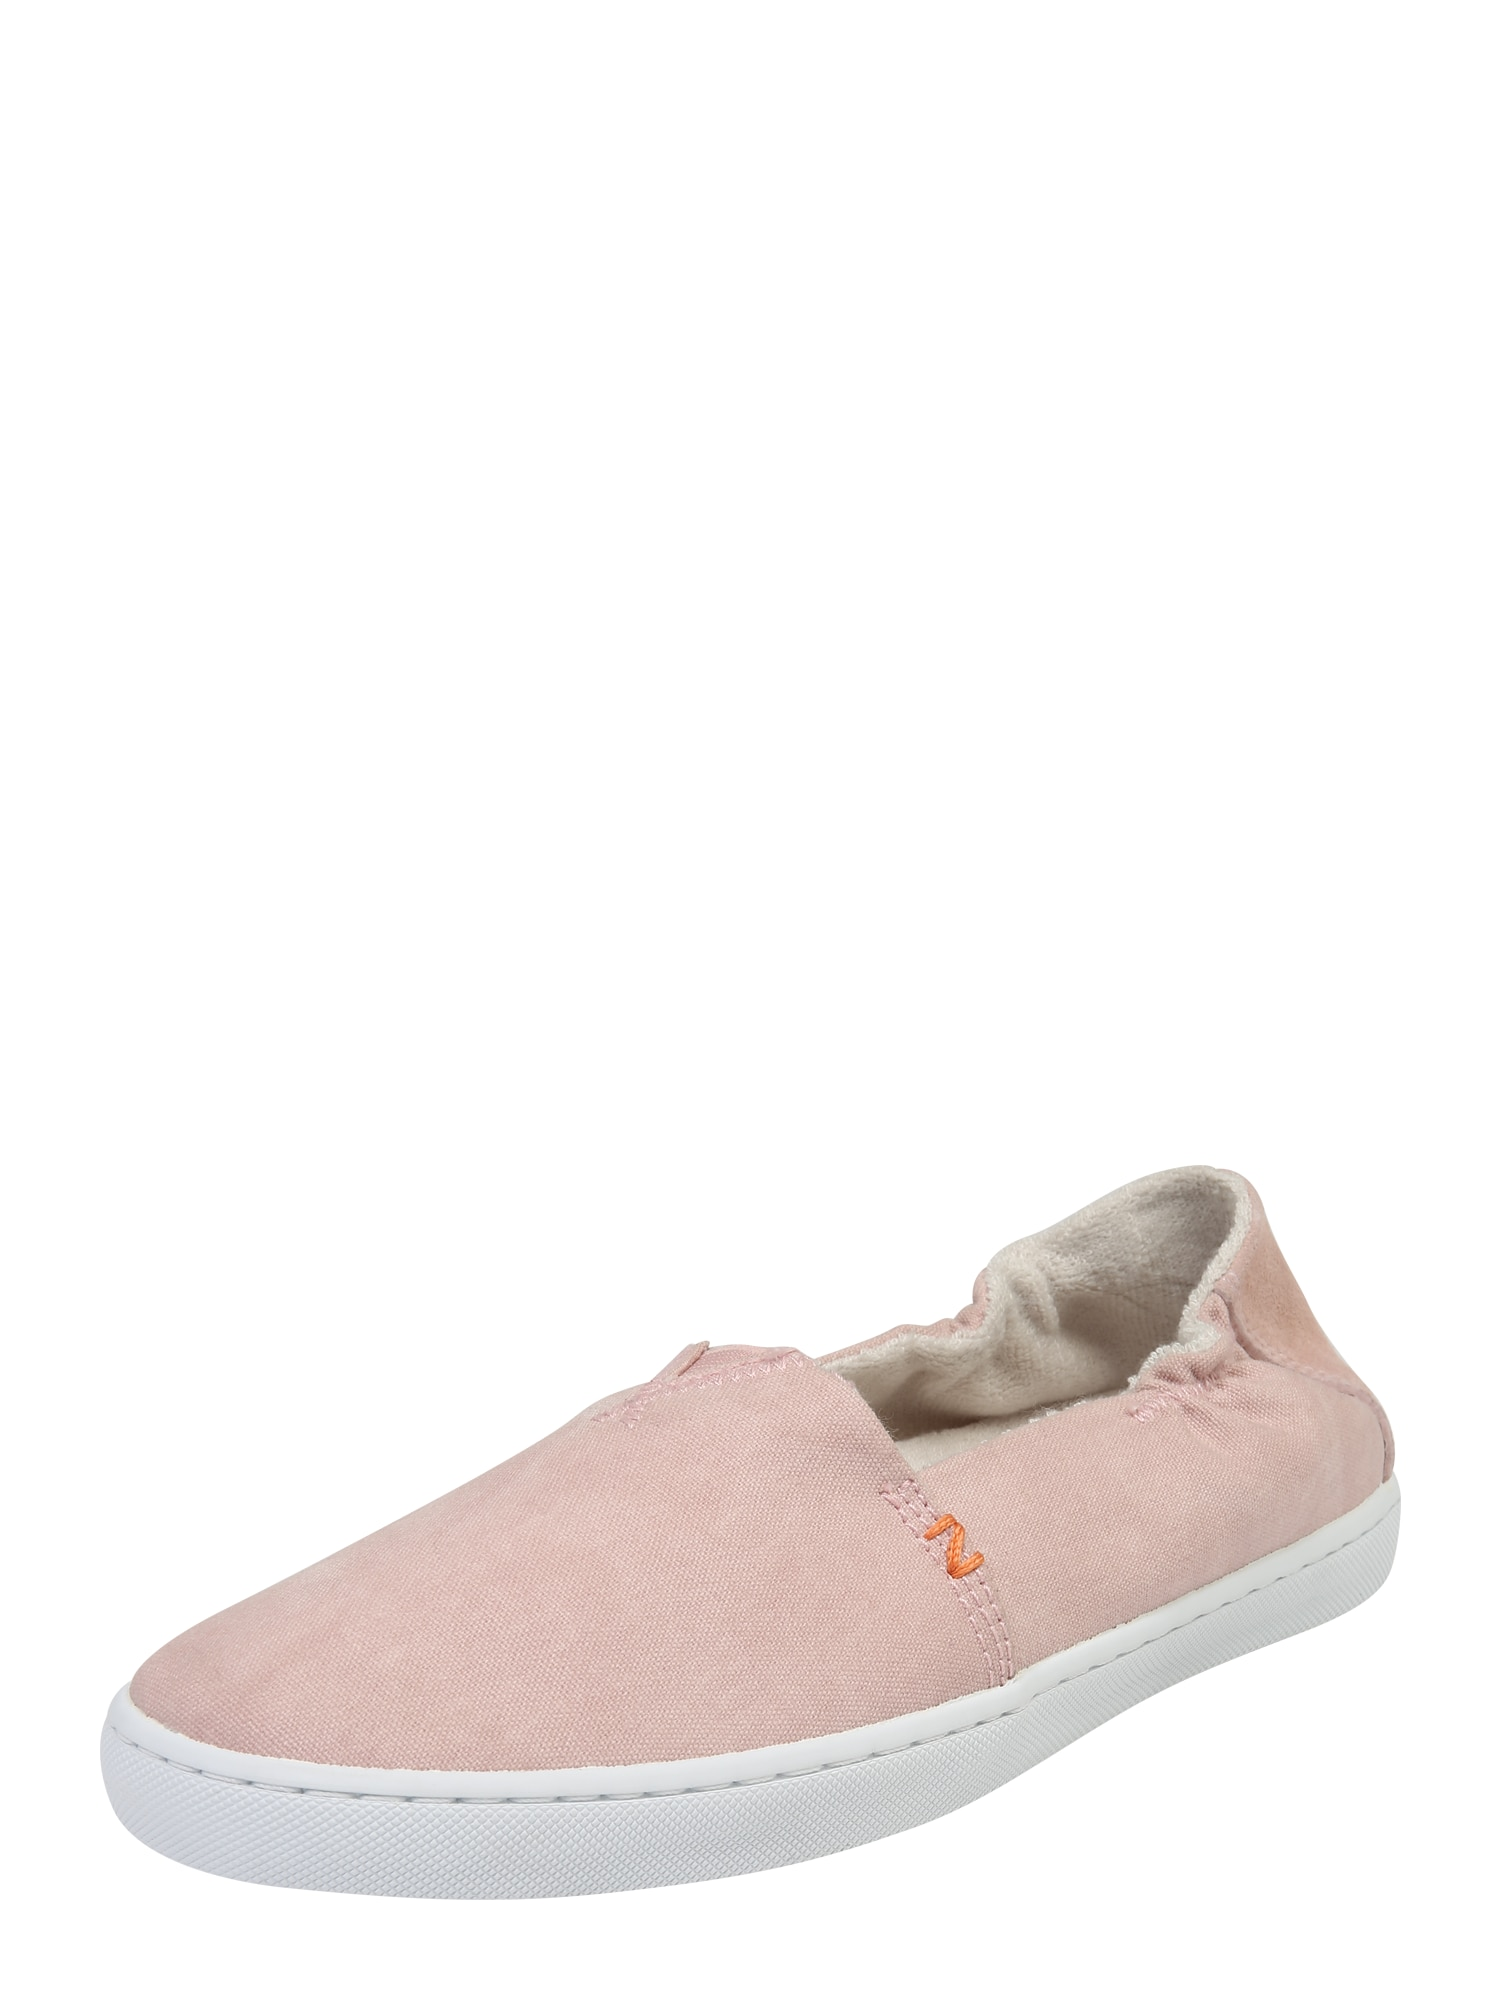 Slip on boty Fuji růžová HUB